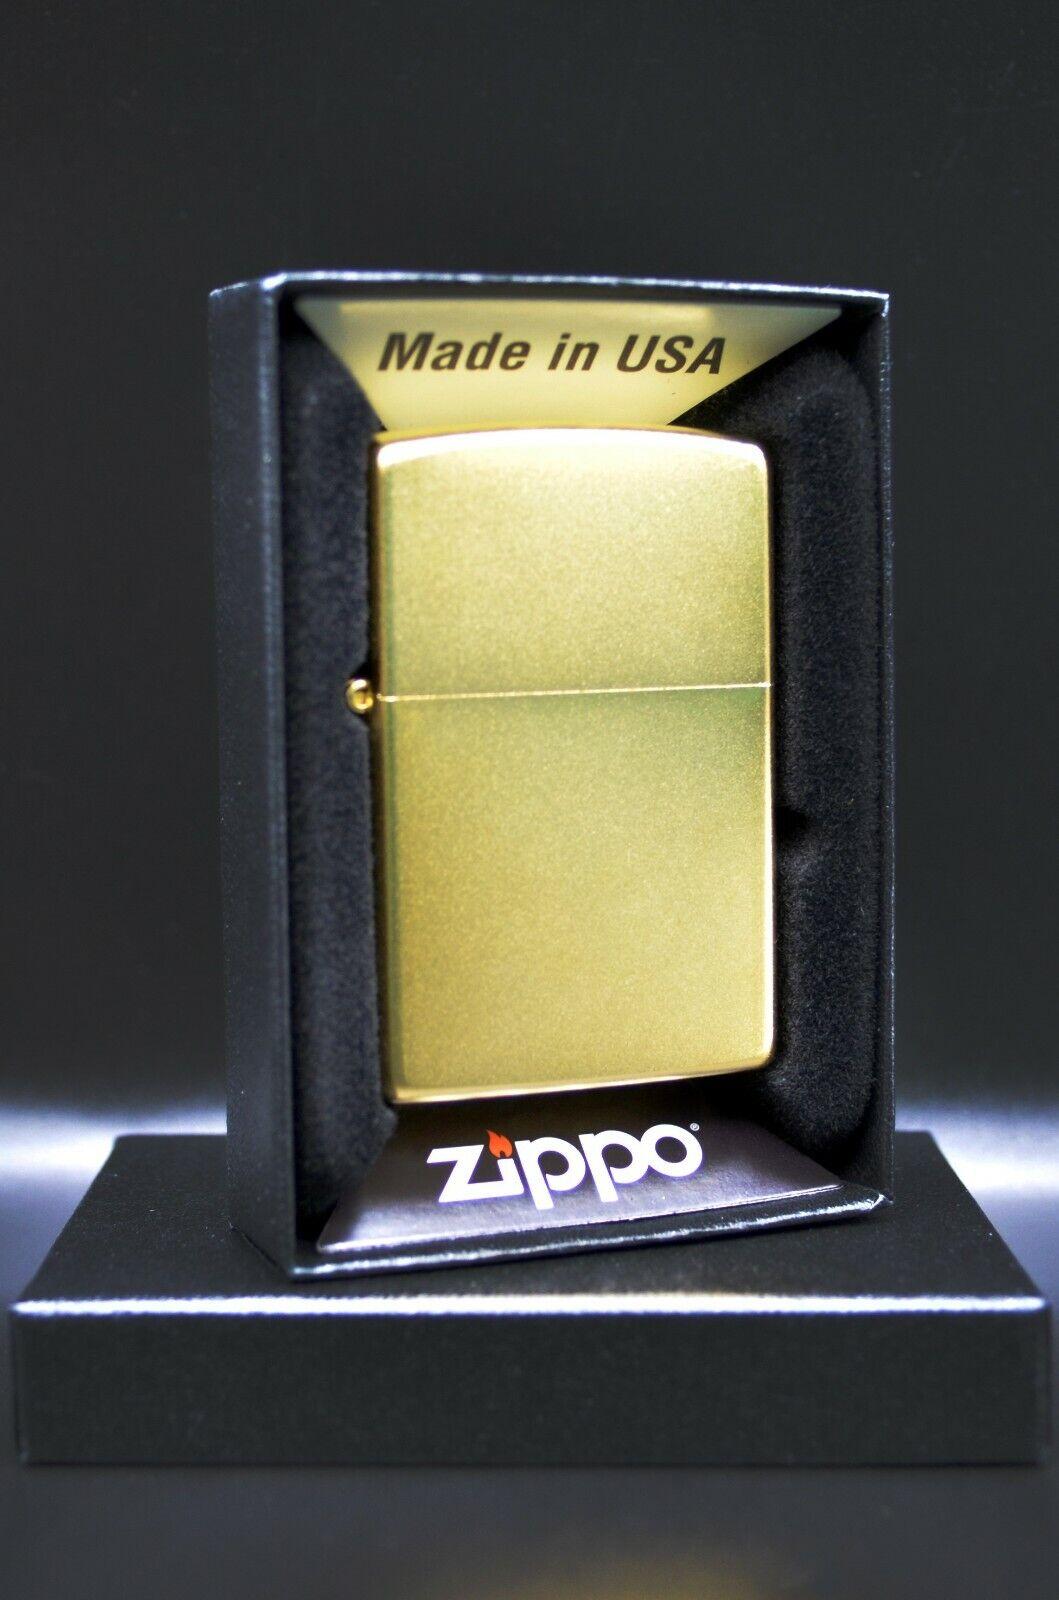 24 Karat  Gold Plated Zippo® Lighter with Satin Finish - Ma